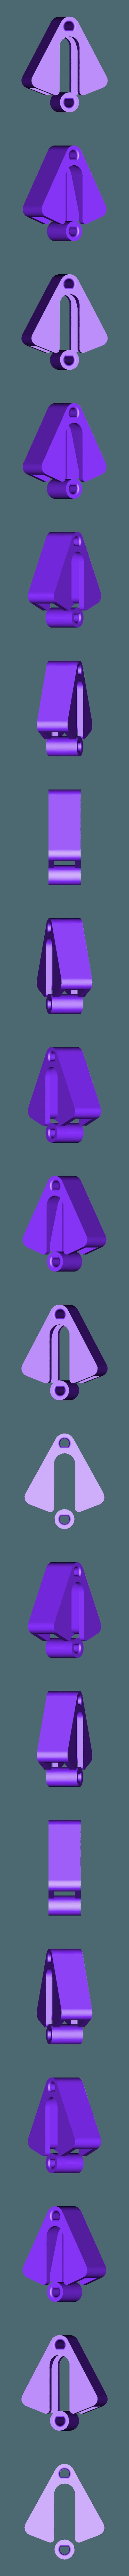 18mm_Ziptie_Belt_Tensioner.stl Download free STL file Minimalist belt tensioner (replaces tensioning springs) • 3D printer model, CartesianCreationsAU